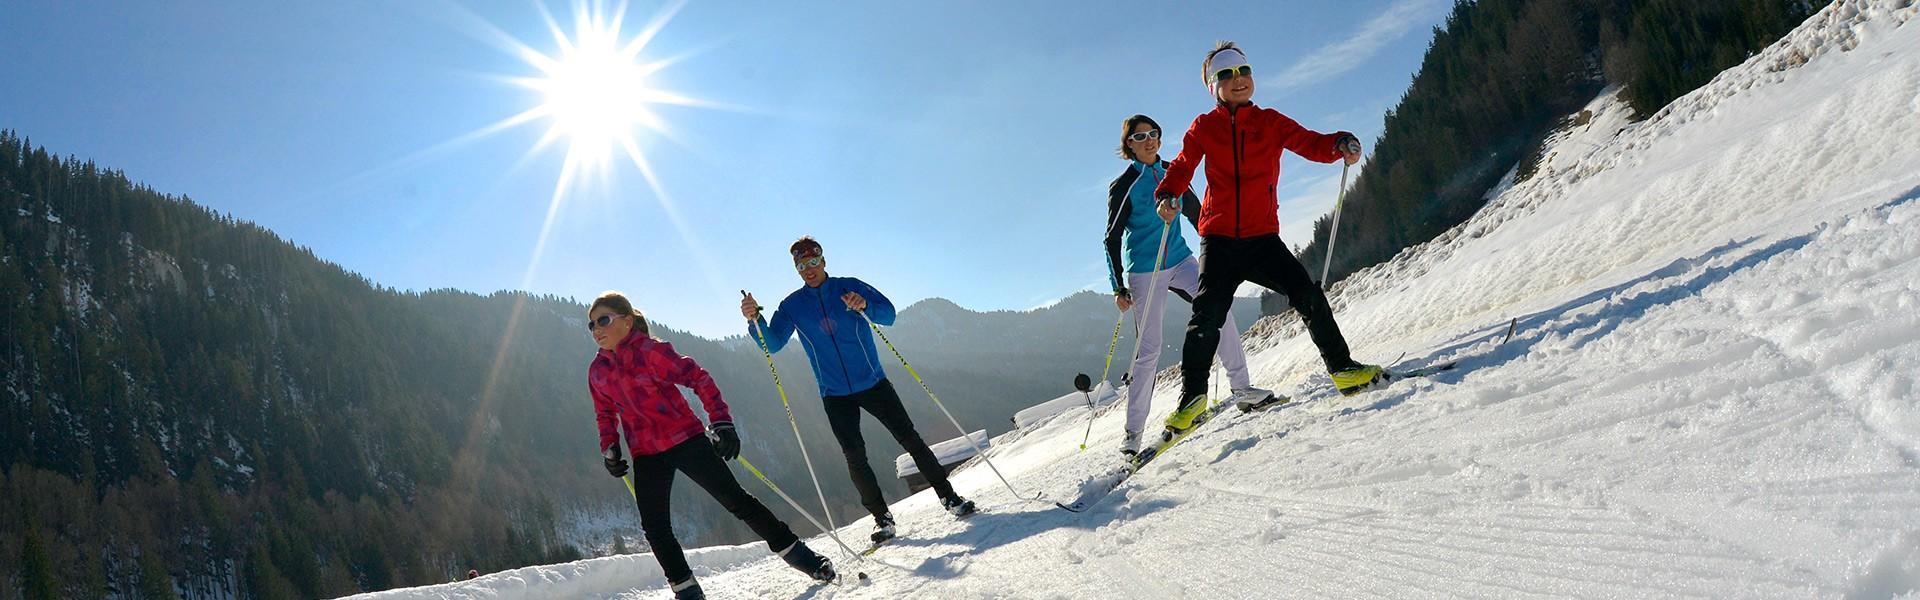 017-a-ski-de-fond-david-machet-h14-2888